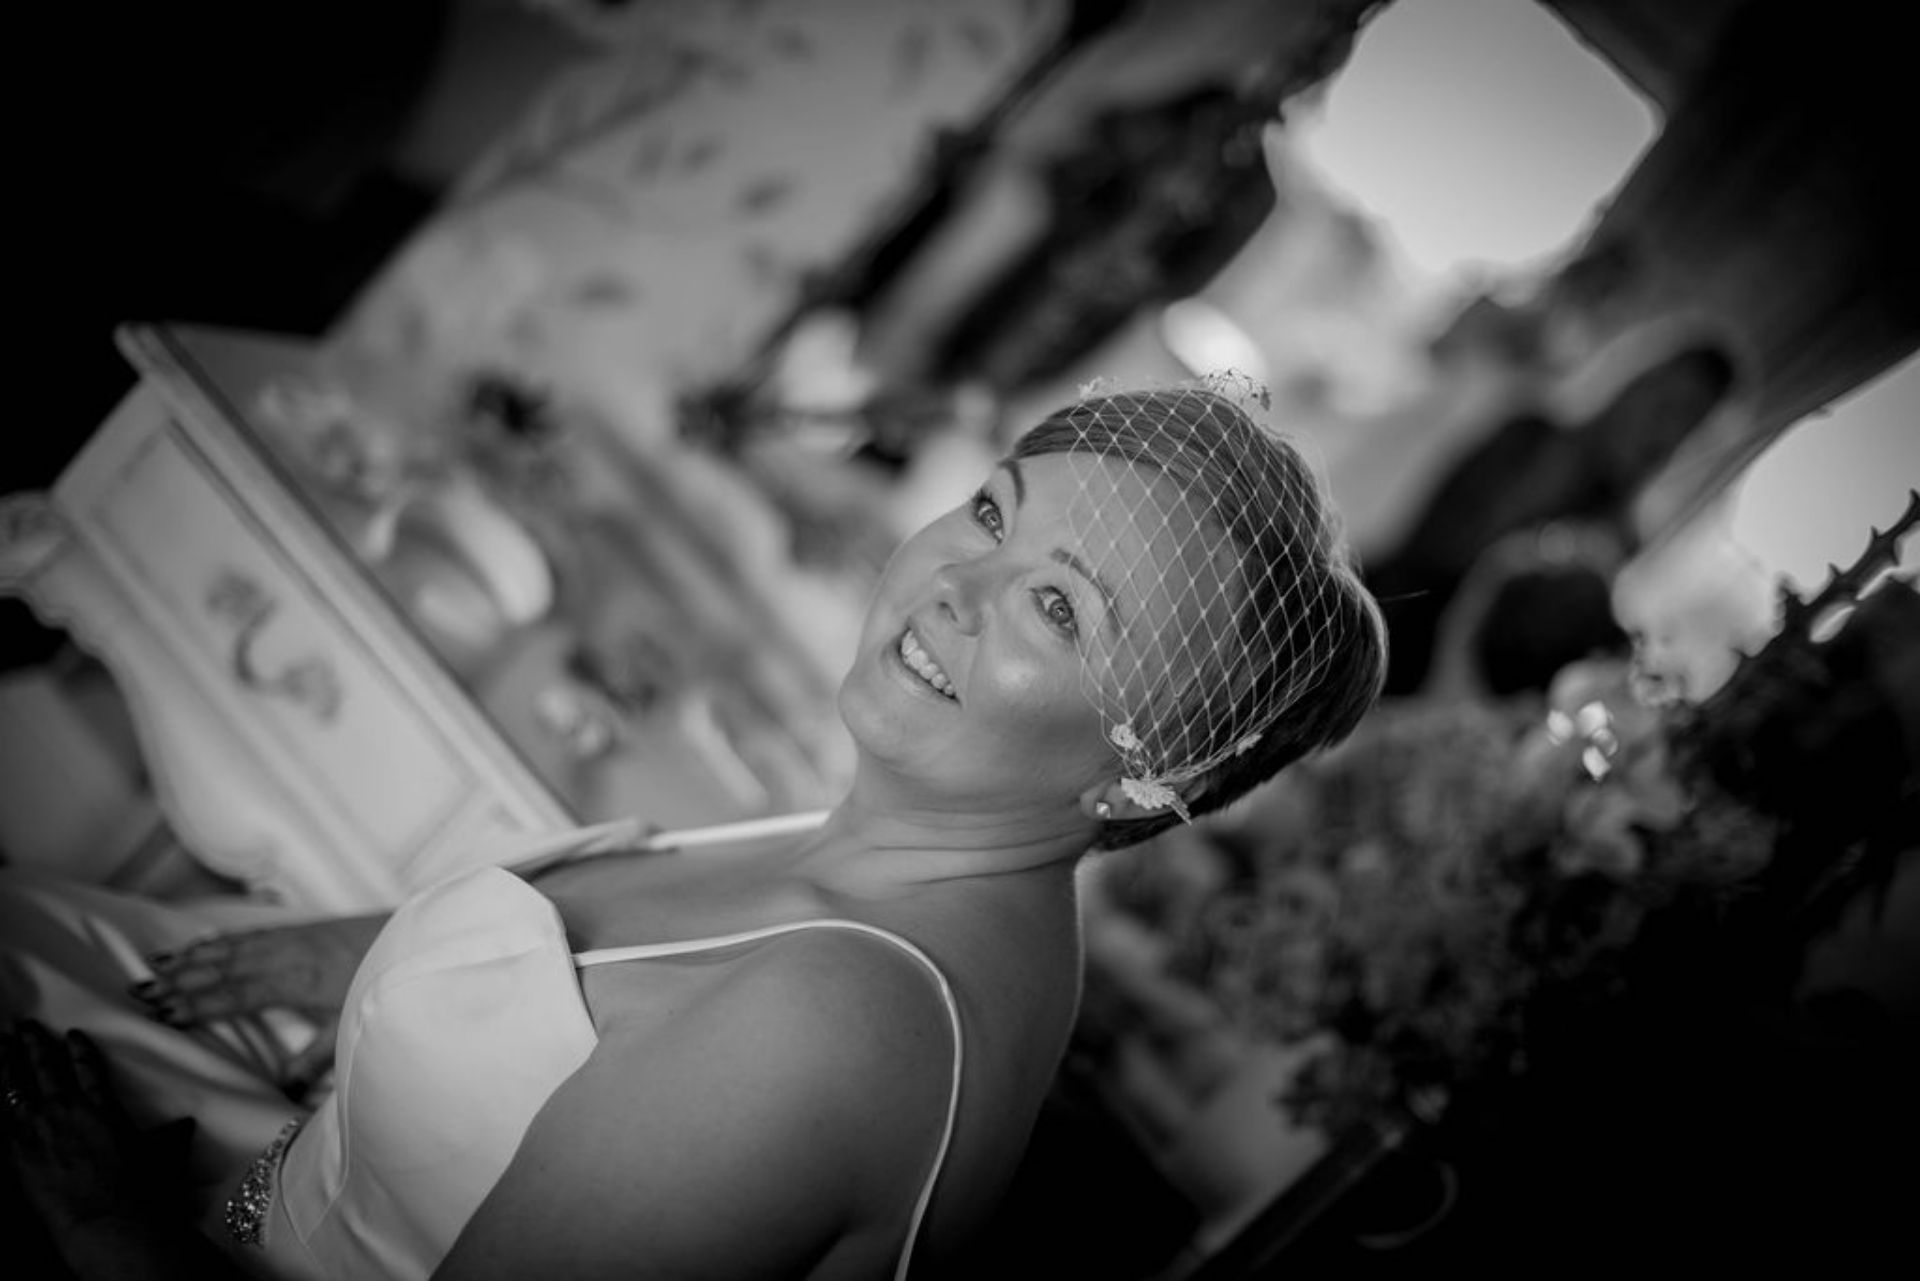 eaves hall, lancashire, lancashire wedding, lancashire bride, lancashire makeup artist, makeup artist, makeup, bridal makeup, wedding makeup